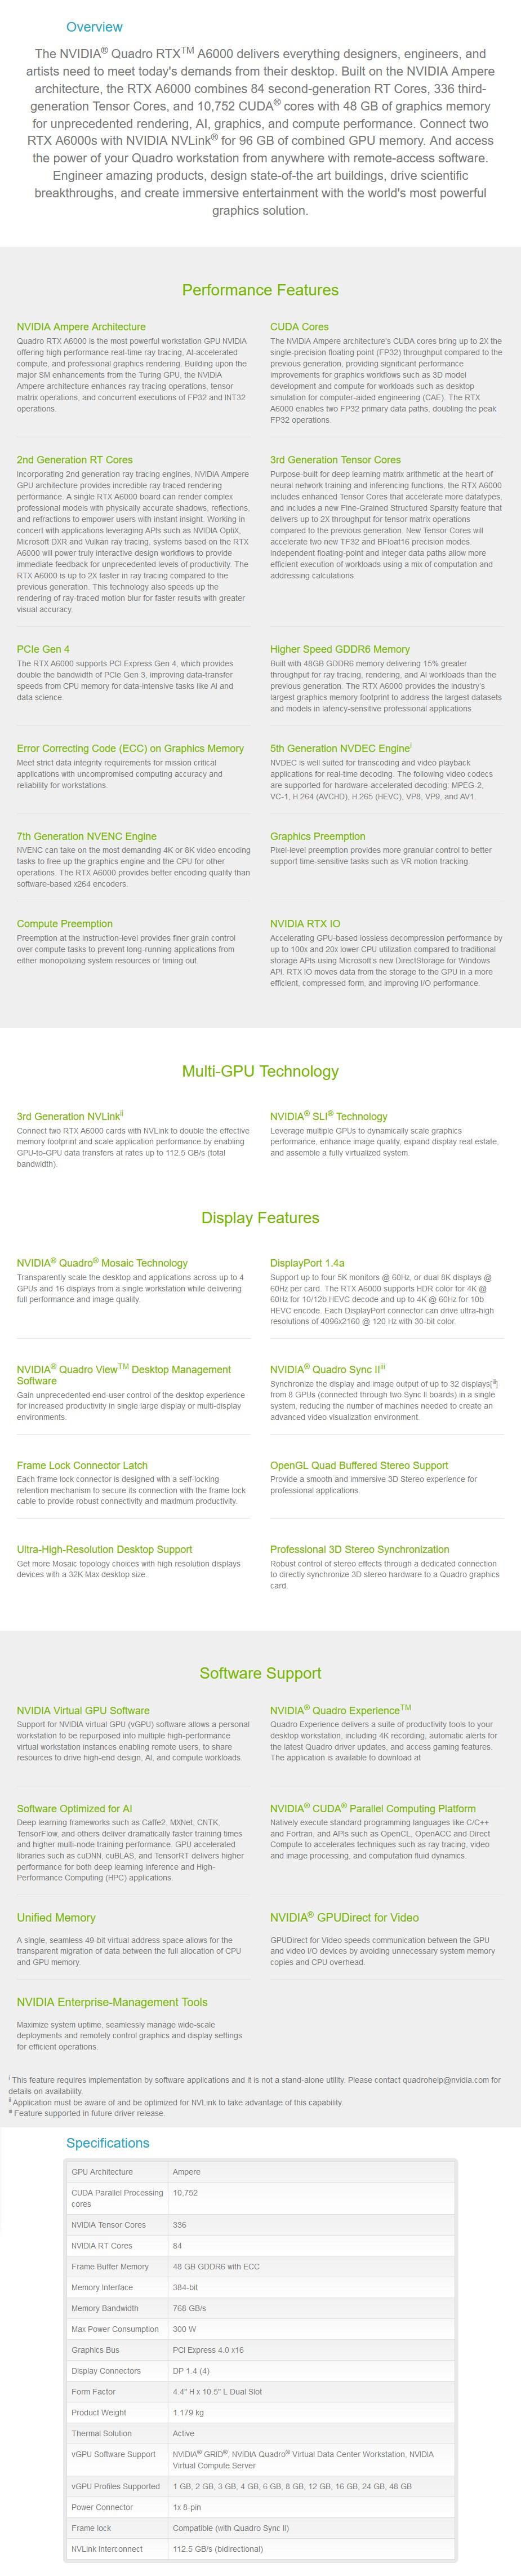 Leadtek NVIDIA Quadro RTX A6000 48GB Video Card - Overview 1